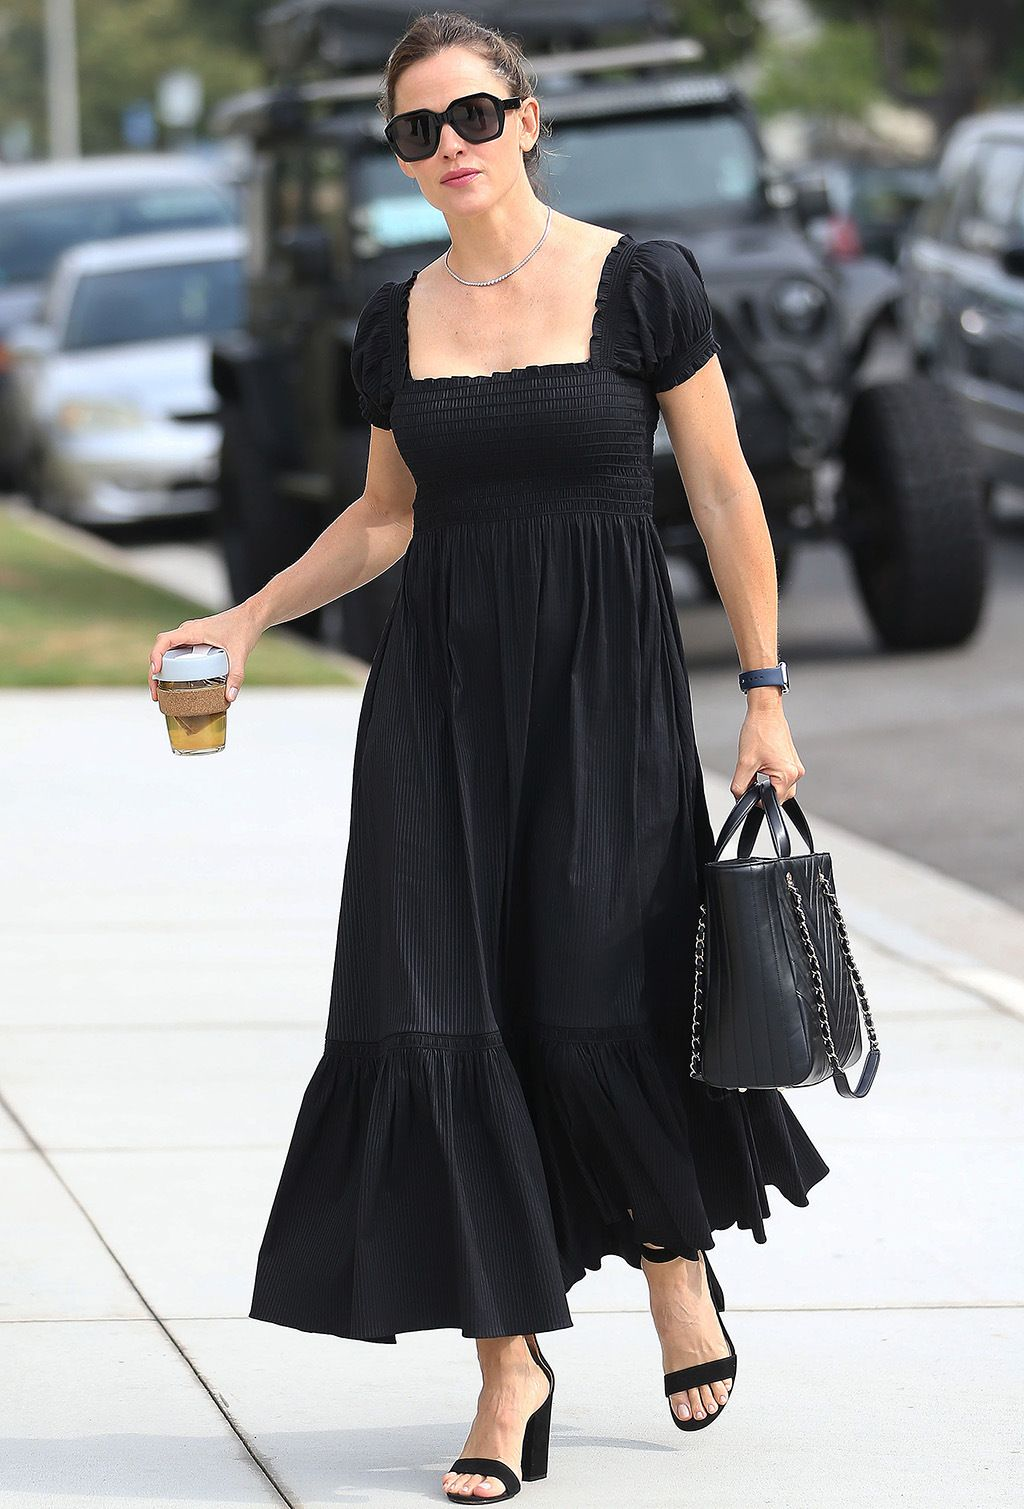 Jennifer Garner Goes To Church In La Wearing Smock Dress 4 Inch Sandals Smock Dress Dresses Jennifer Garner [ 1509 x 1024 Pixel ]